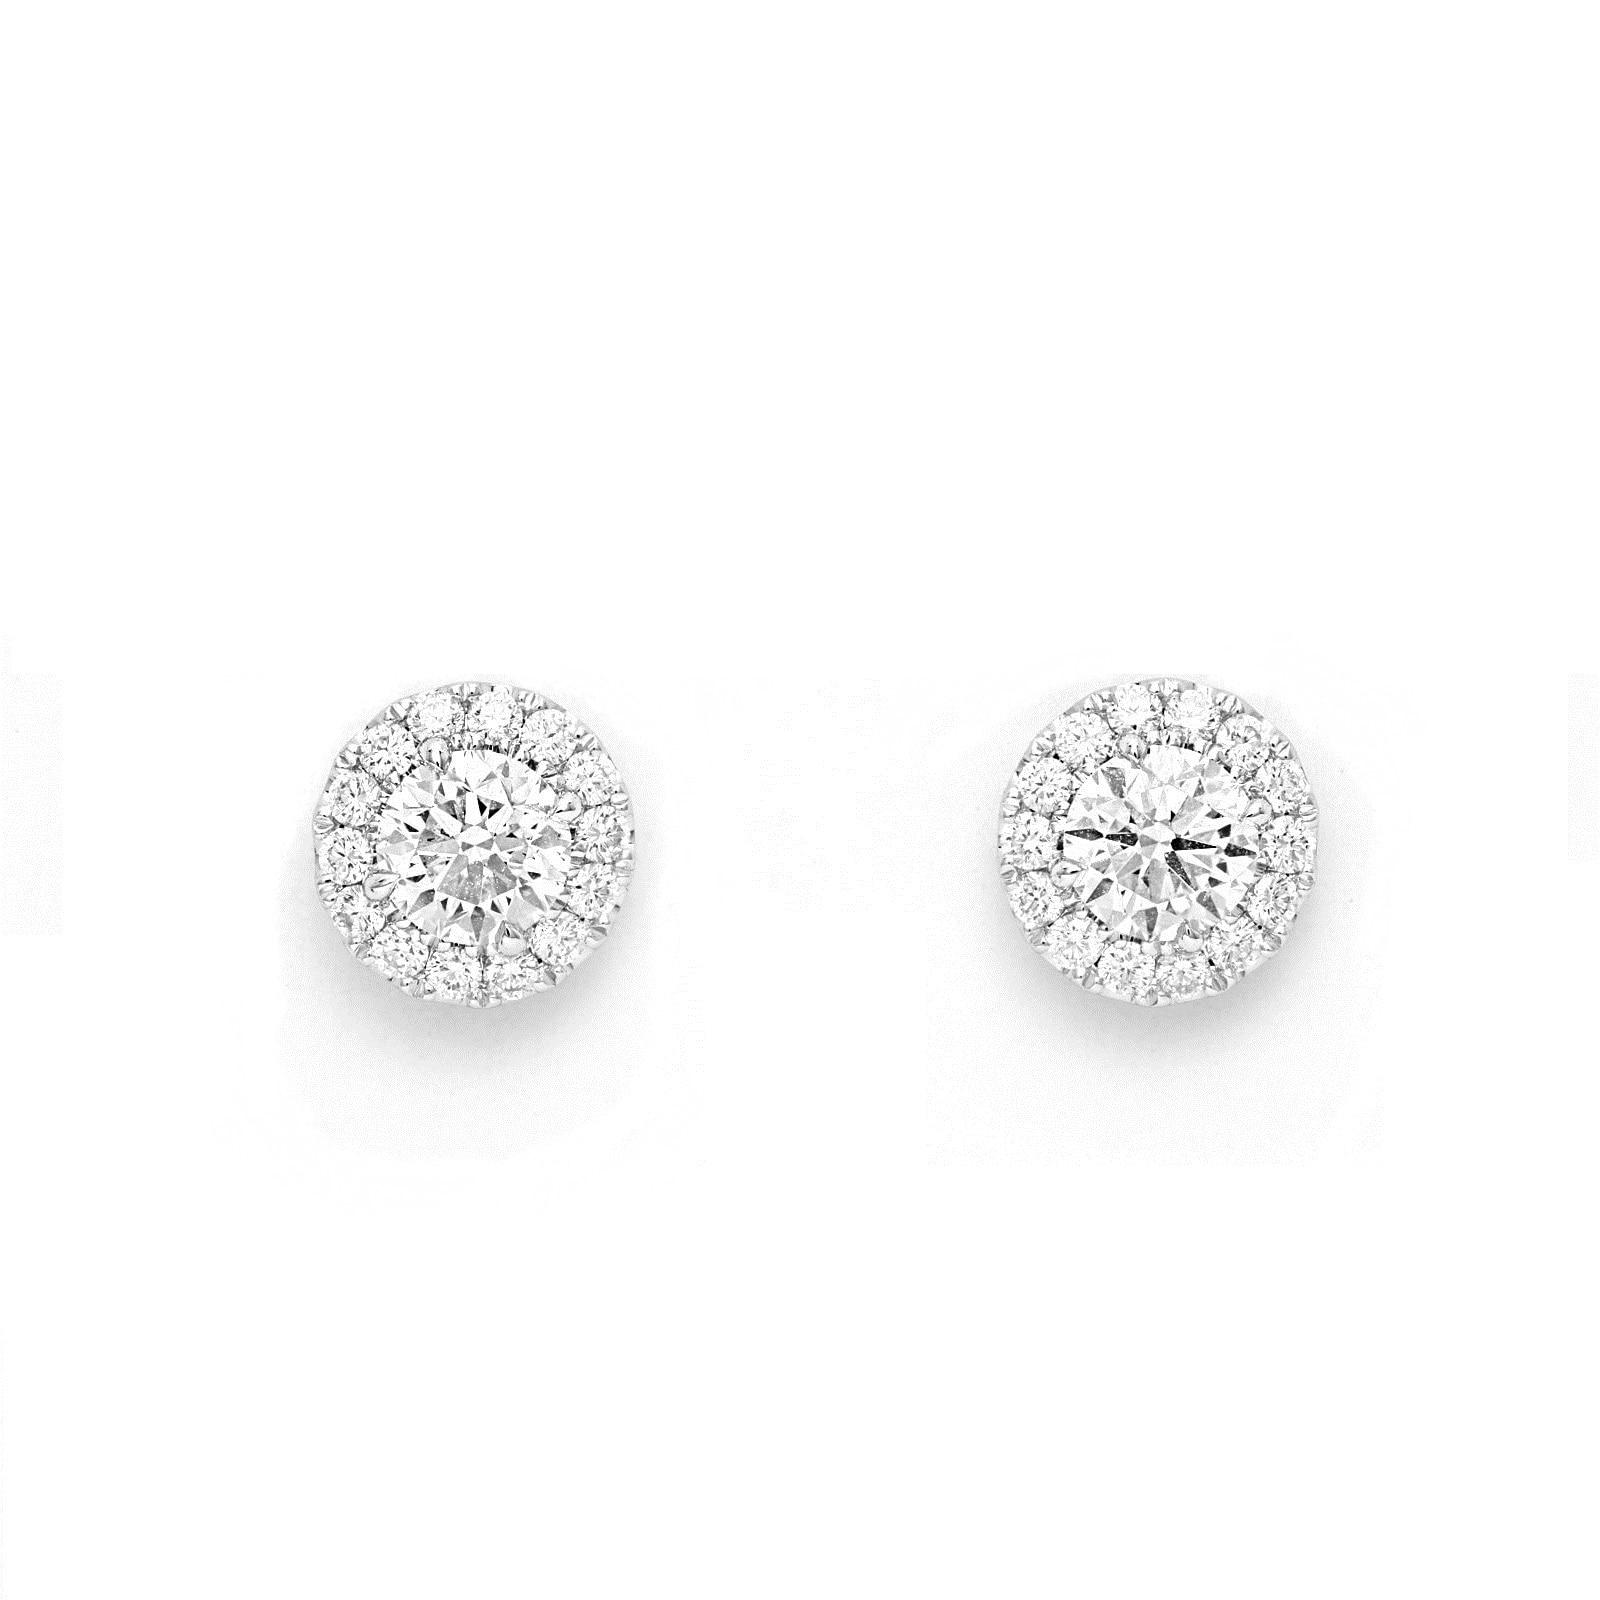 Mayors 18ct White Gold 1.07ct Single Halo Stud Earrings